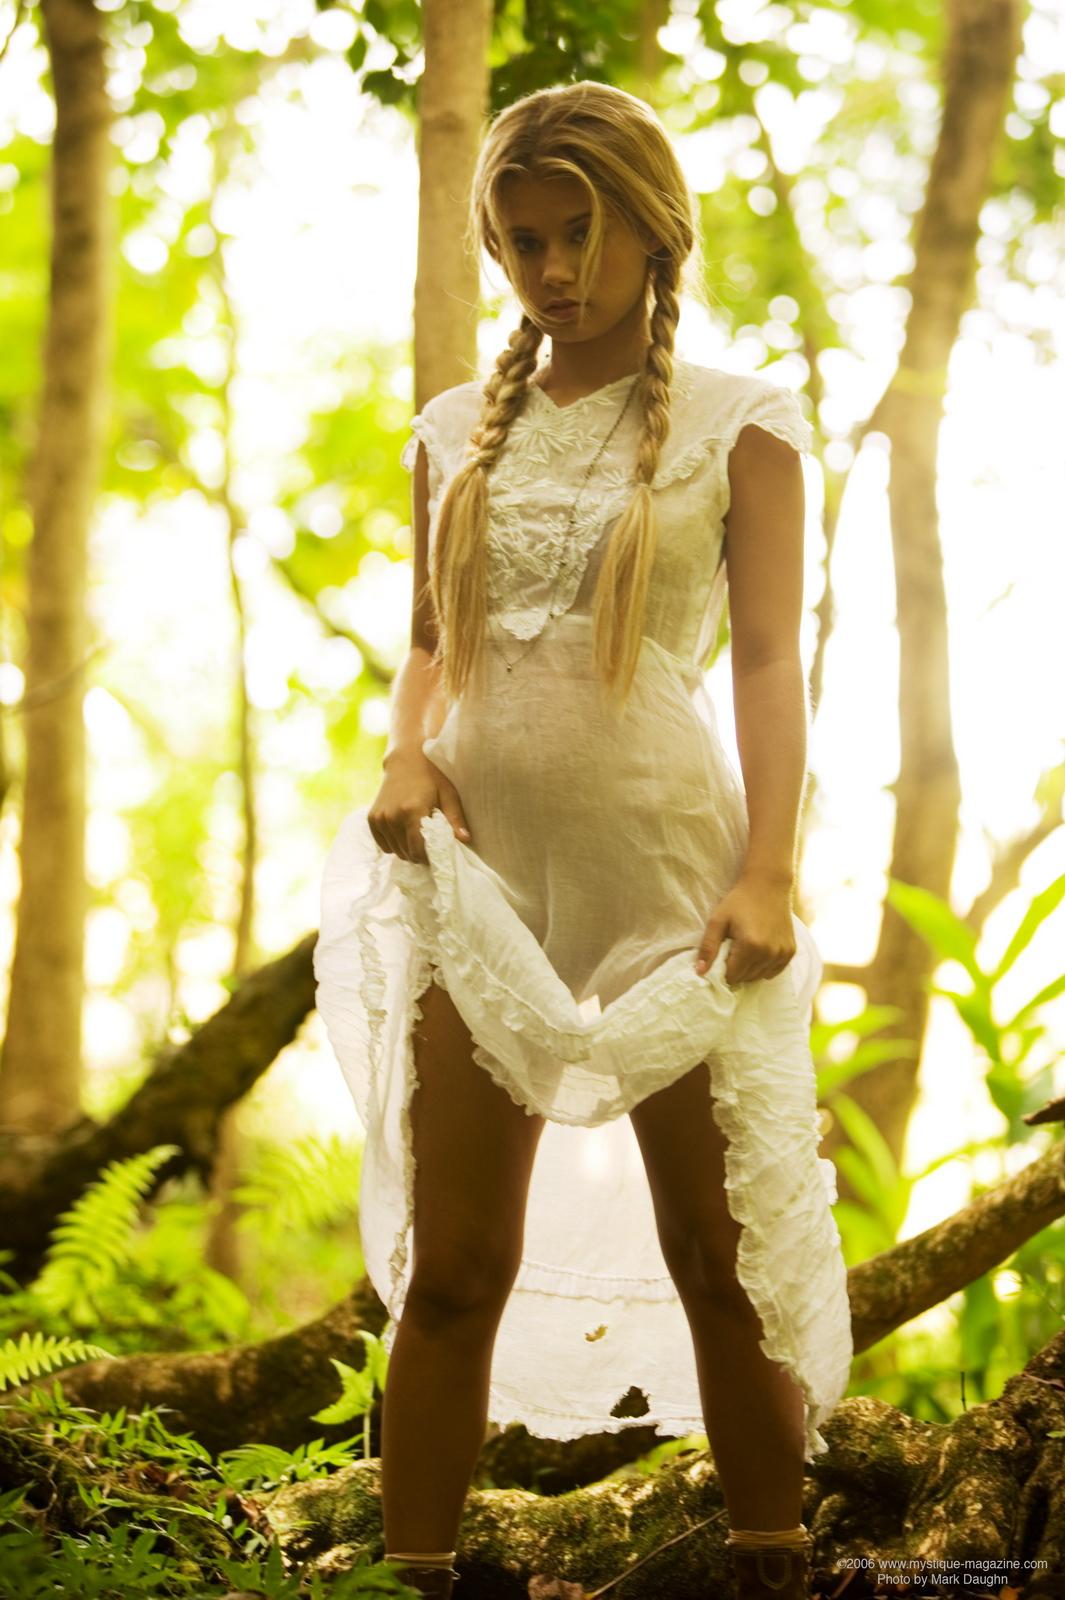 jannah-burnham-woods-blonde-pigtails-naked-mystique-magazine-05